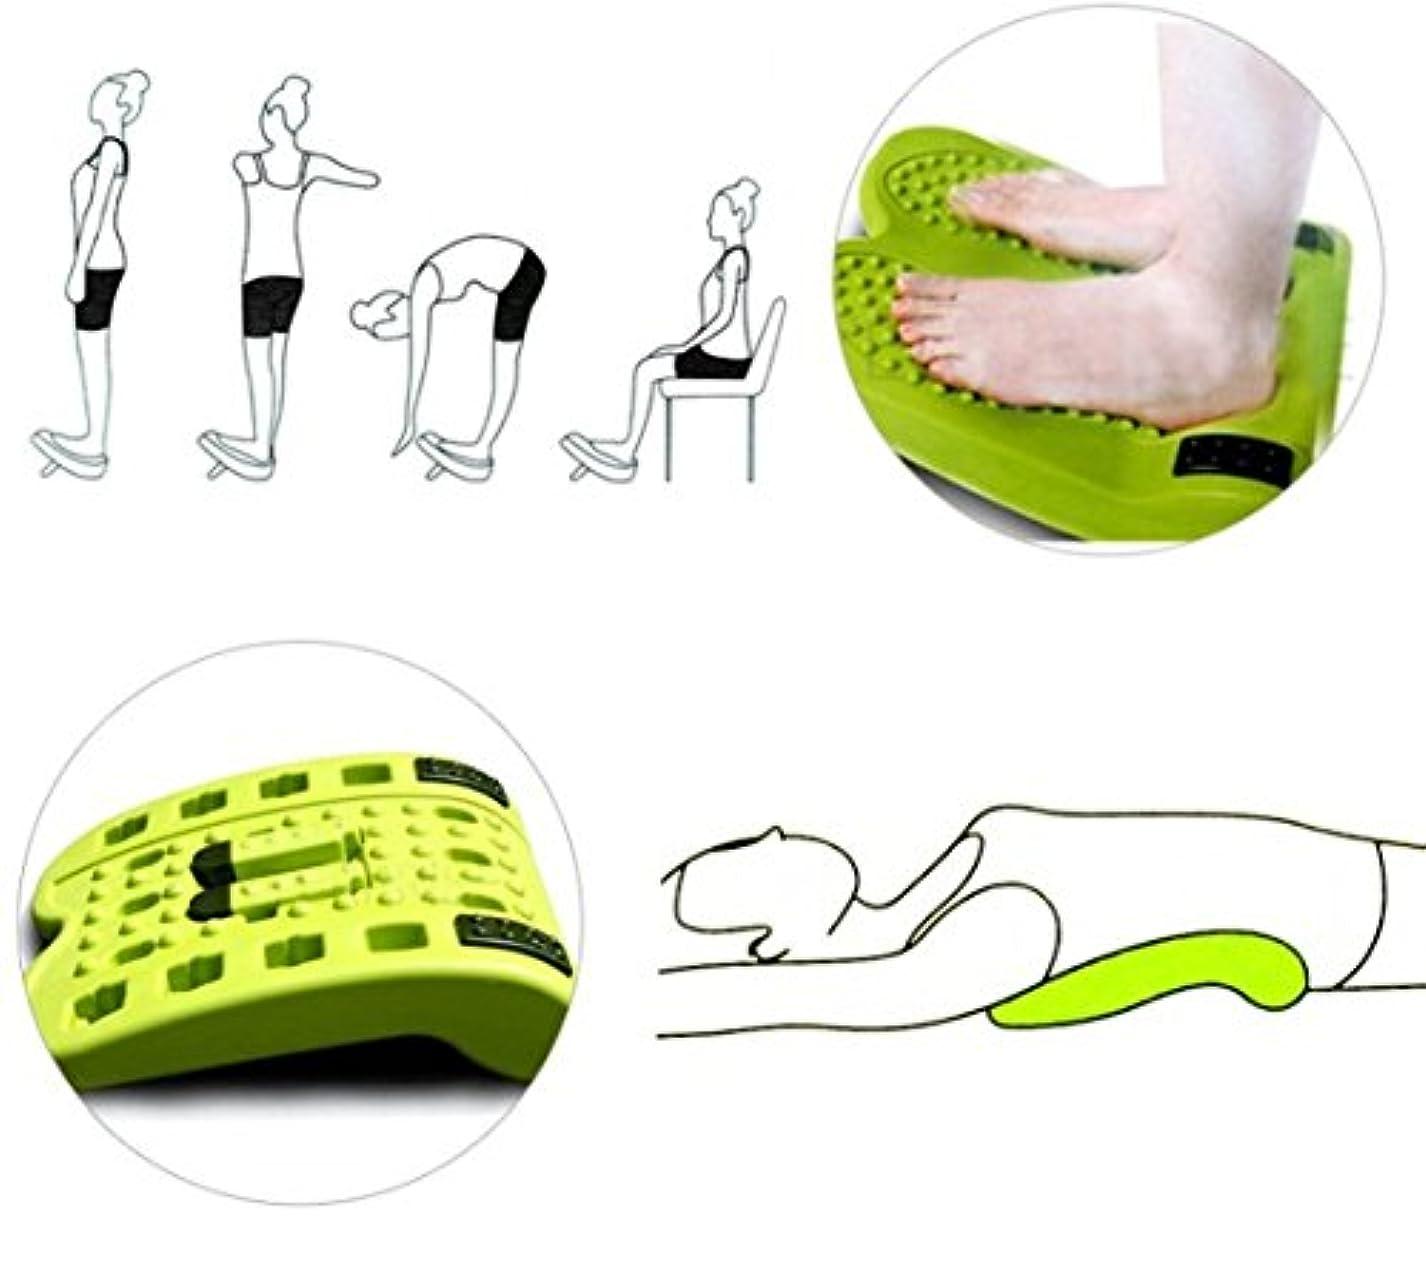 IWANNA足のストレッチマルチ傾斜ボード3段階の調節可能な傾斜+など、足のストレッチマッサージ(海外直送品)